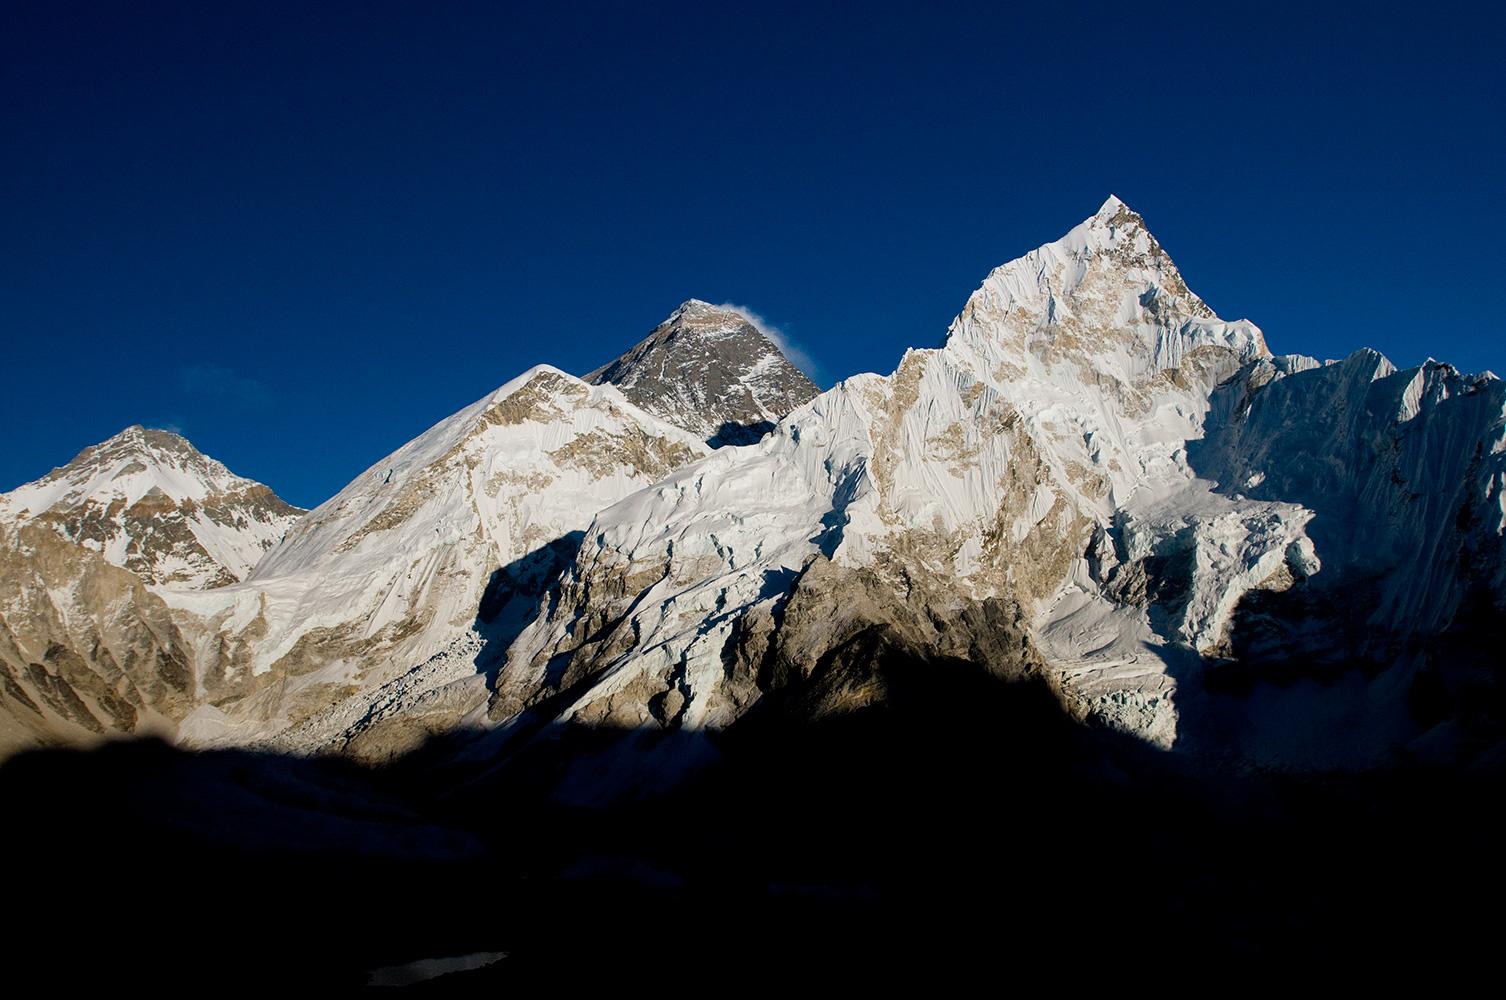 From Kala Pattar (5550m) above Gorak ShepNikon D300, 17-35mm. November 2008